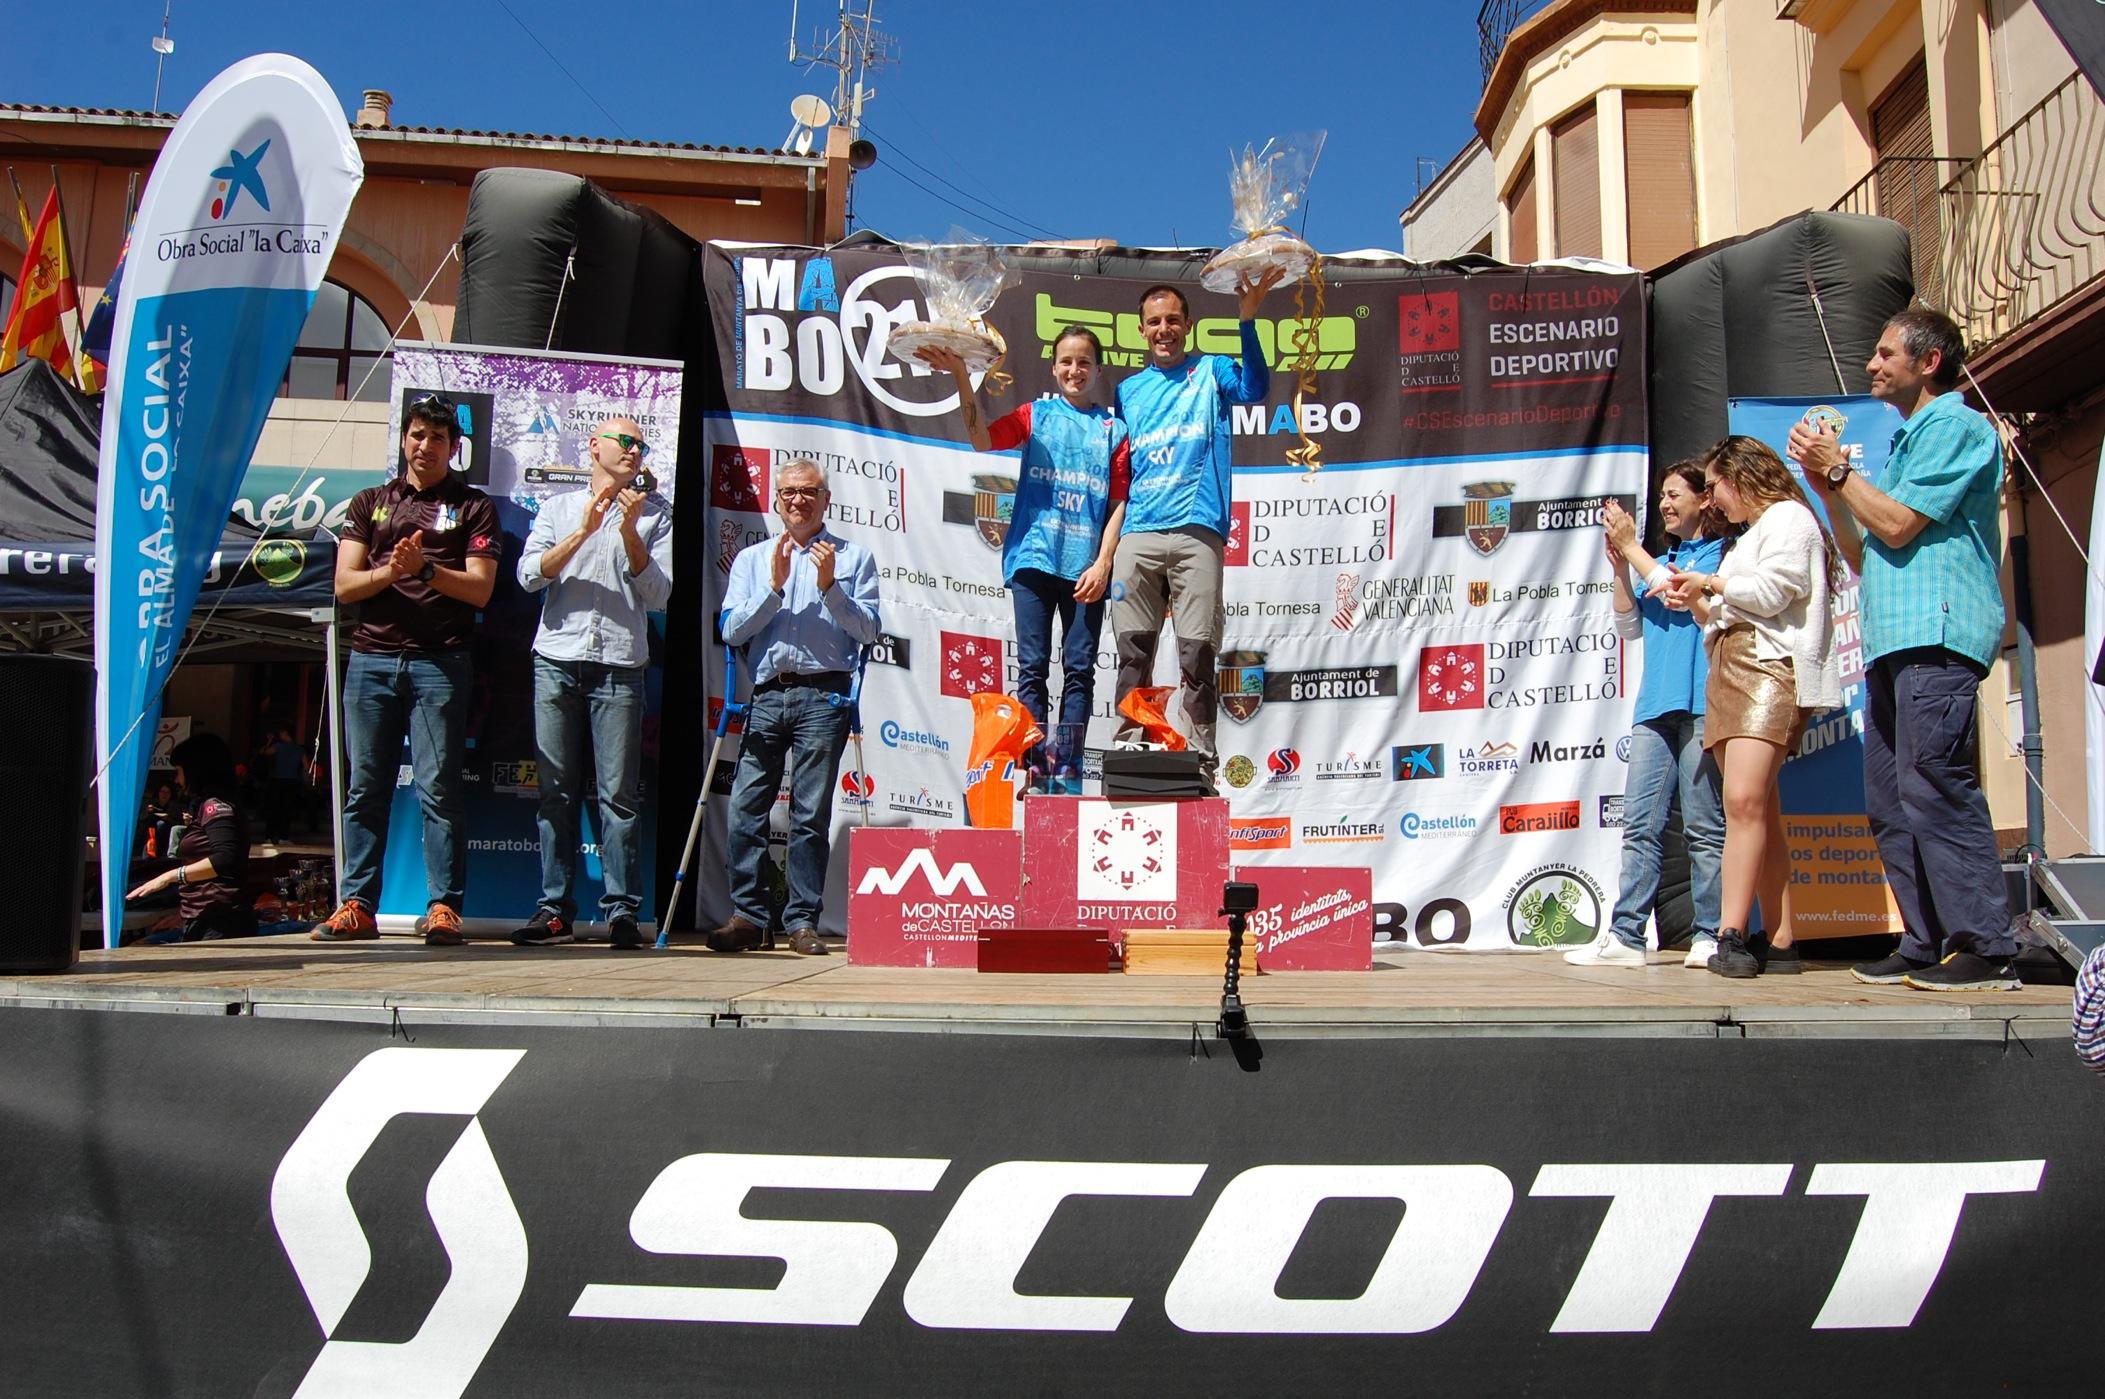 Dani Garc�a y Eli Gord�n se apuntan el Skyrunning National Championship Skymarathon en la Marat� de Muntanya de Borriol